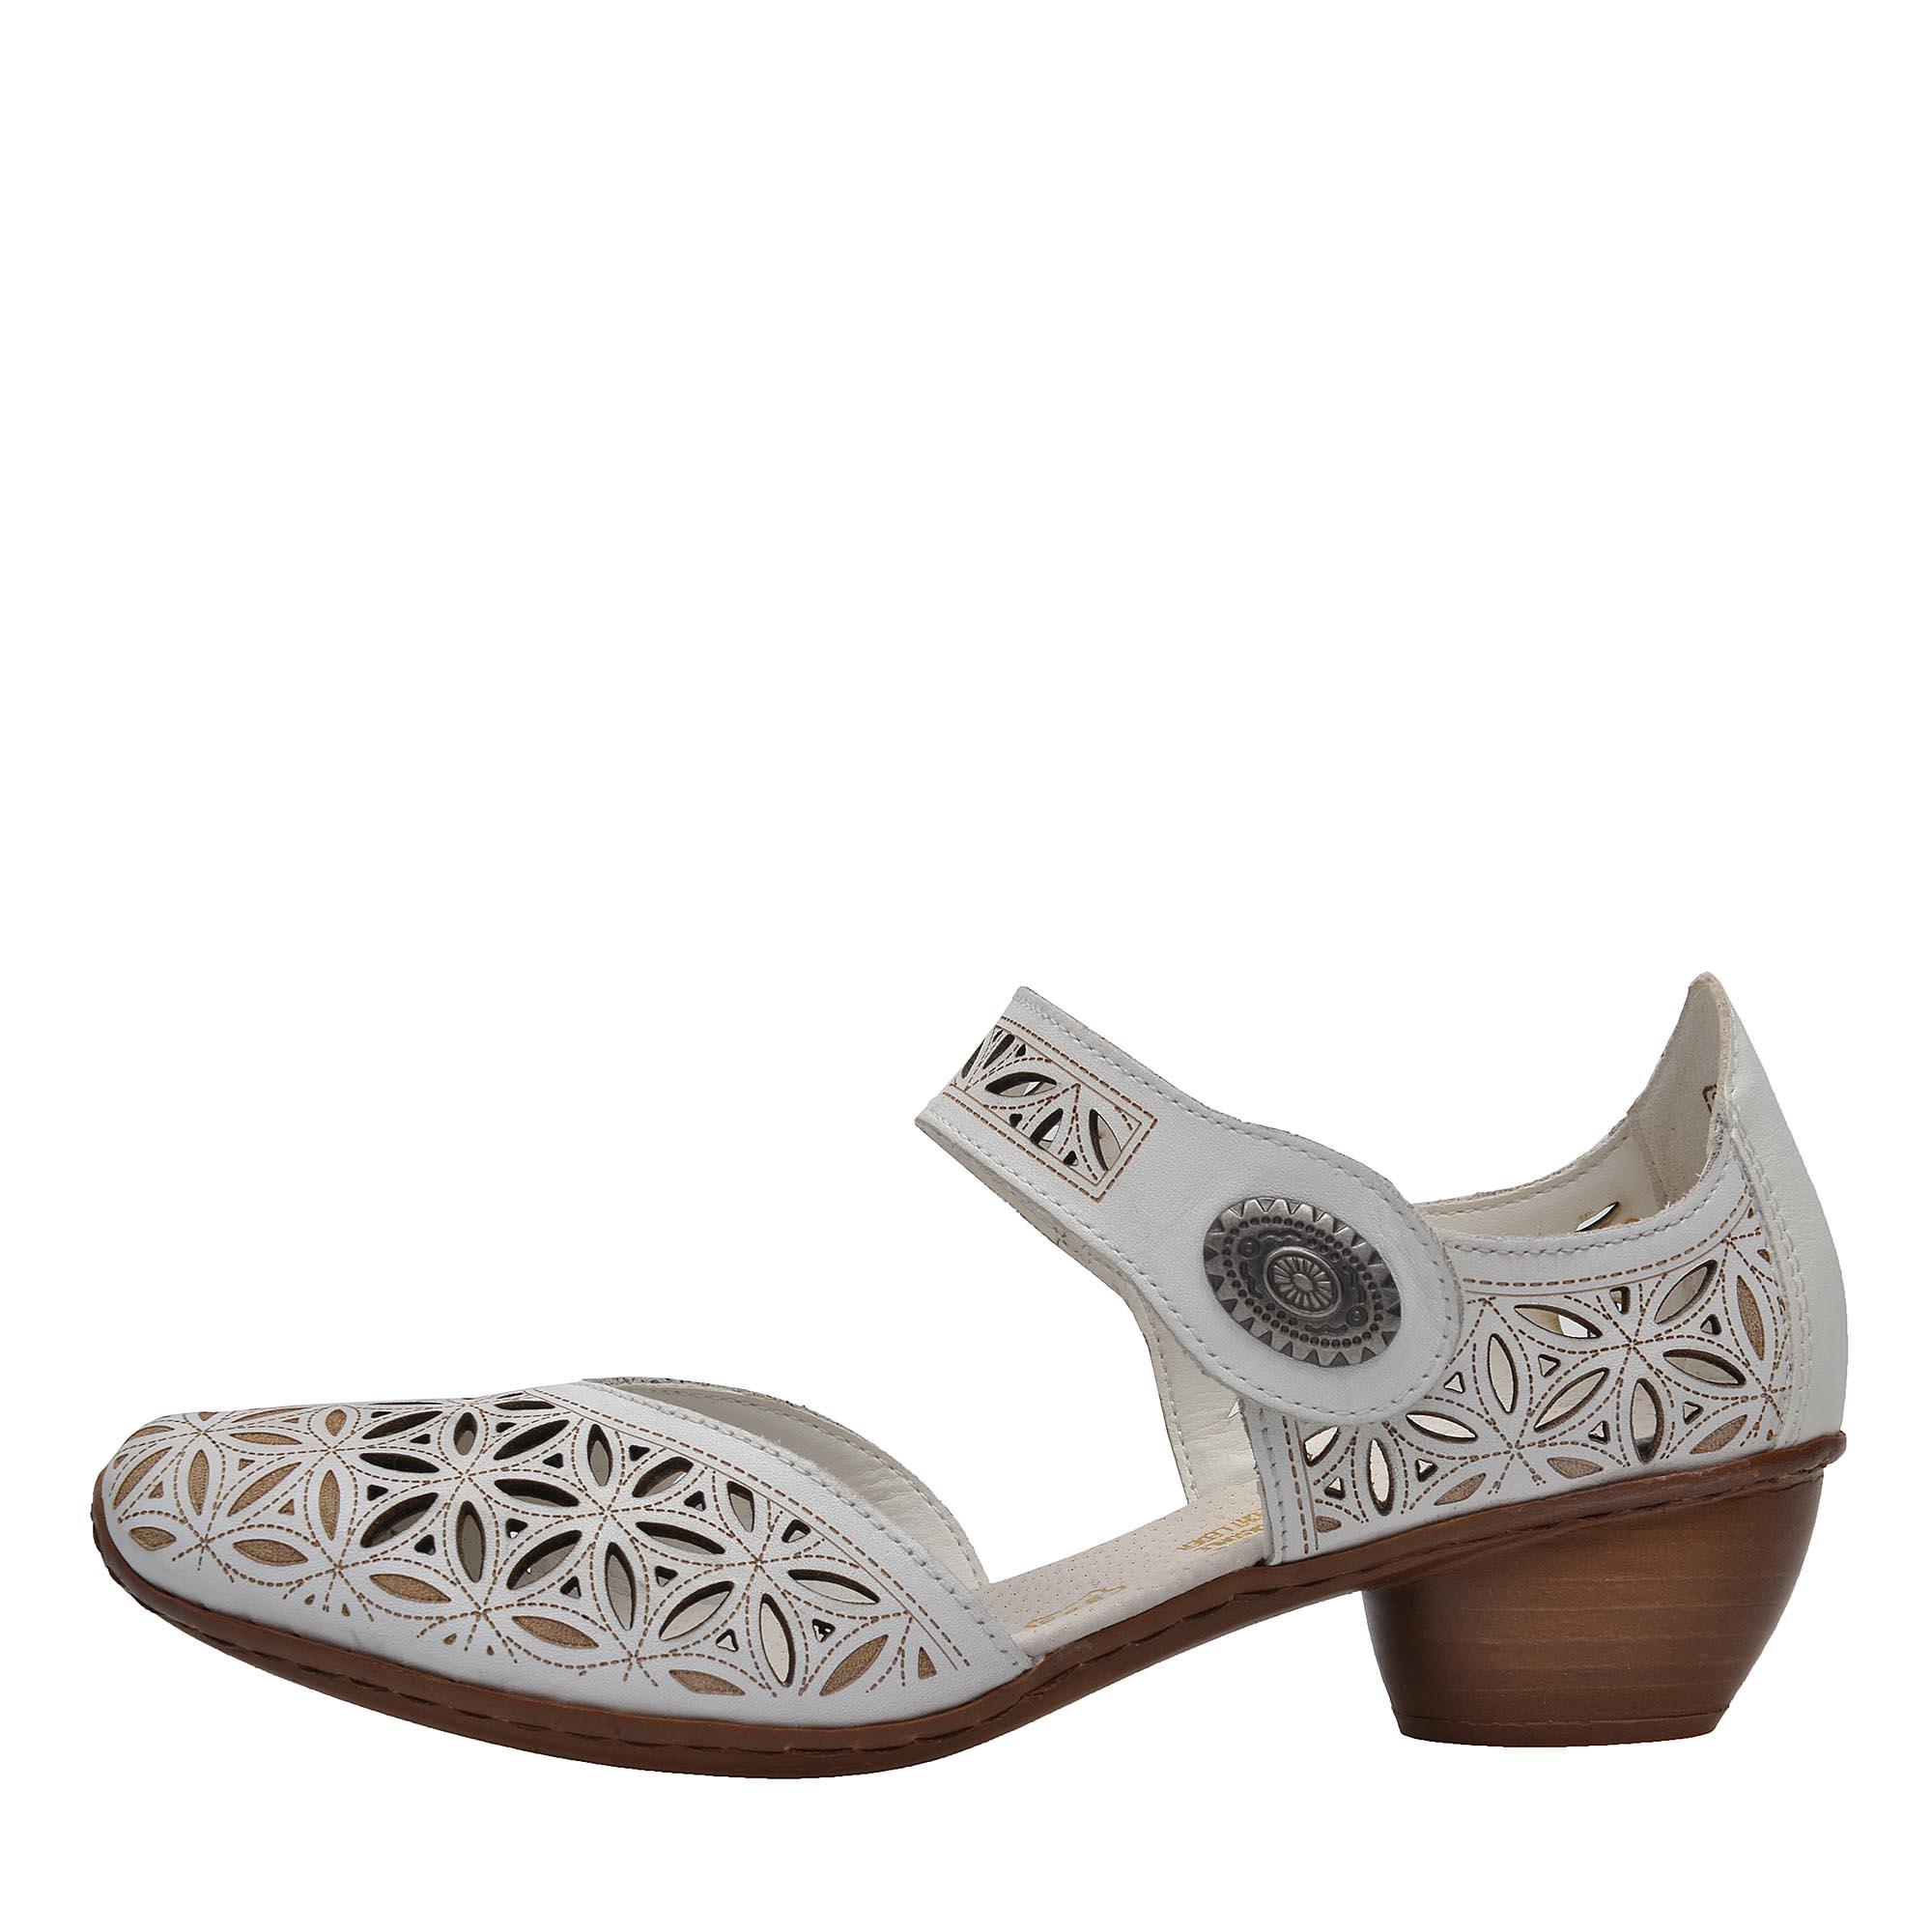 89cba2eab2 detail Dámská obuv RIEKER 43726 80 WEISS F S 8